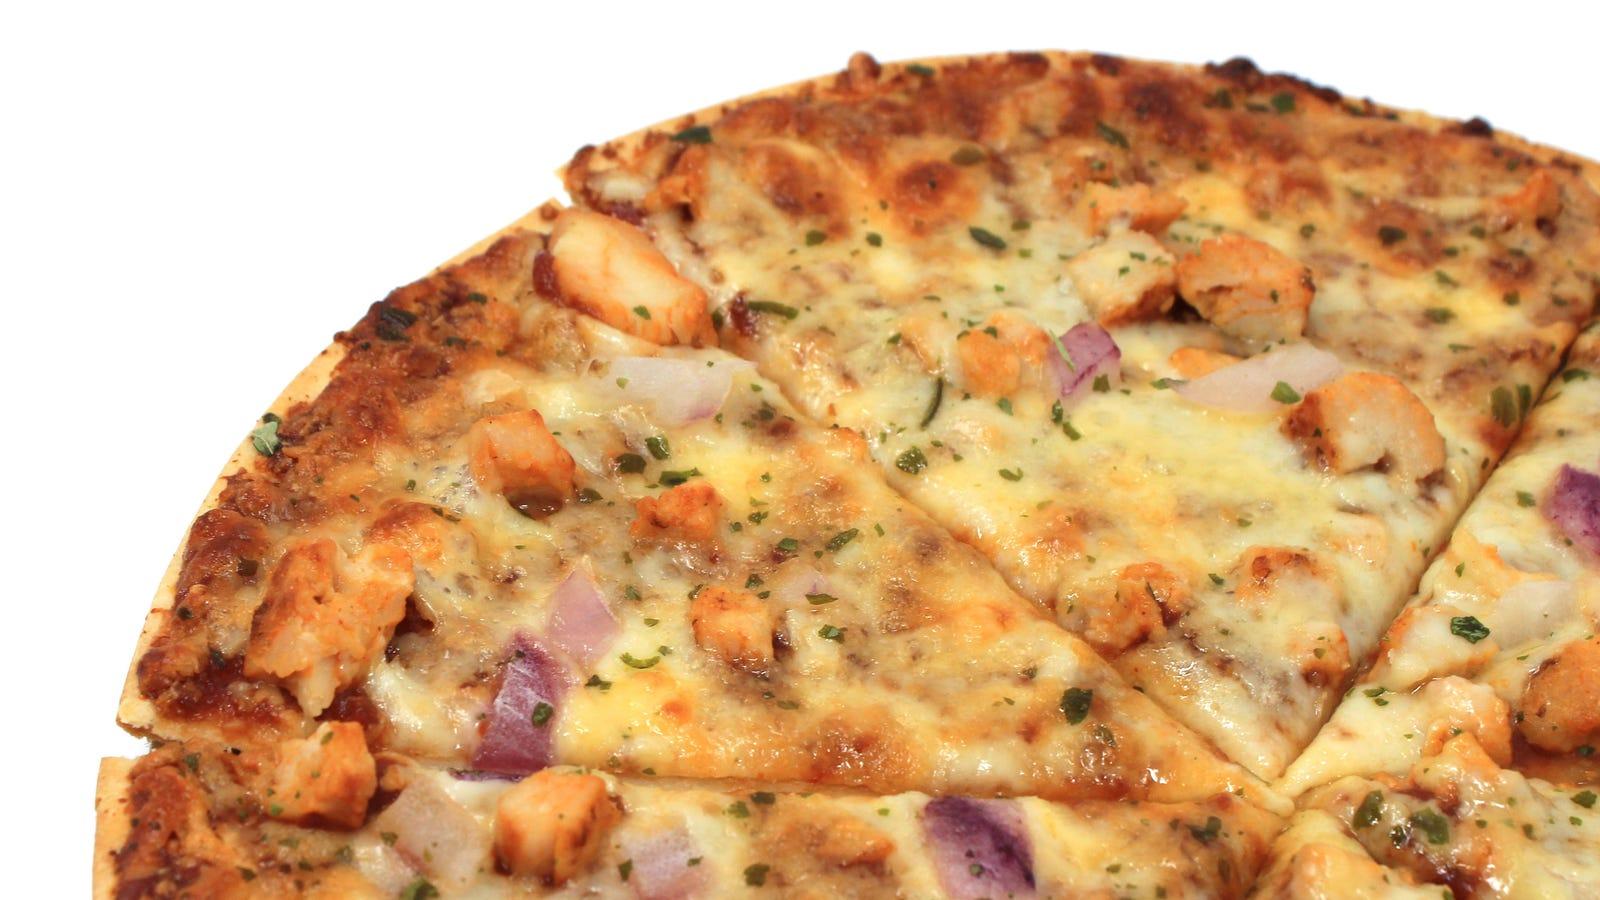 California Pizza Kitchen Frozen Bbq Chicken Pizza Calories